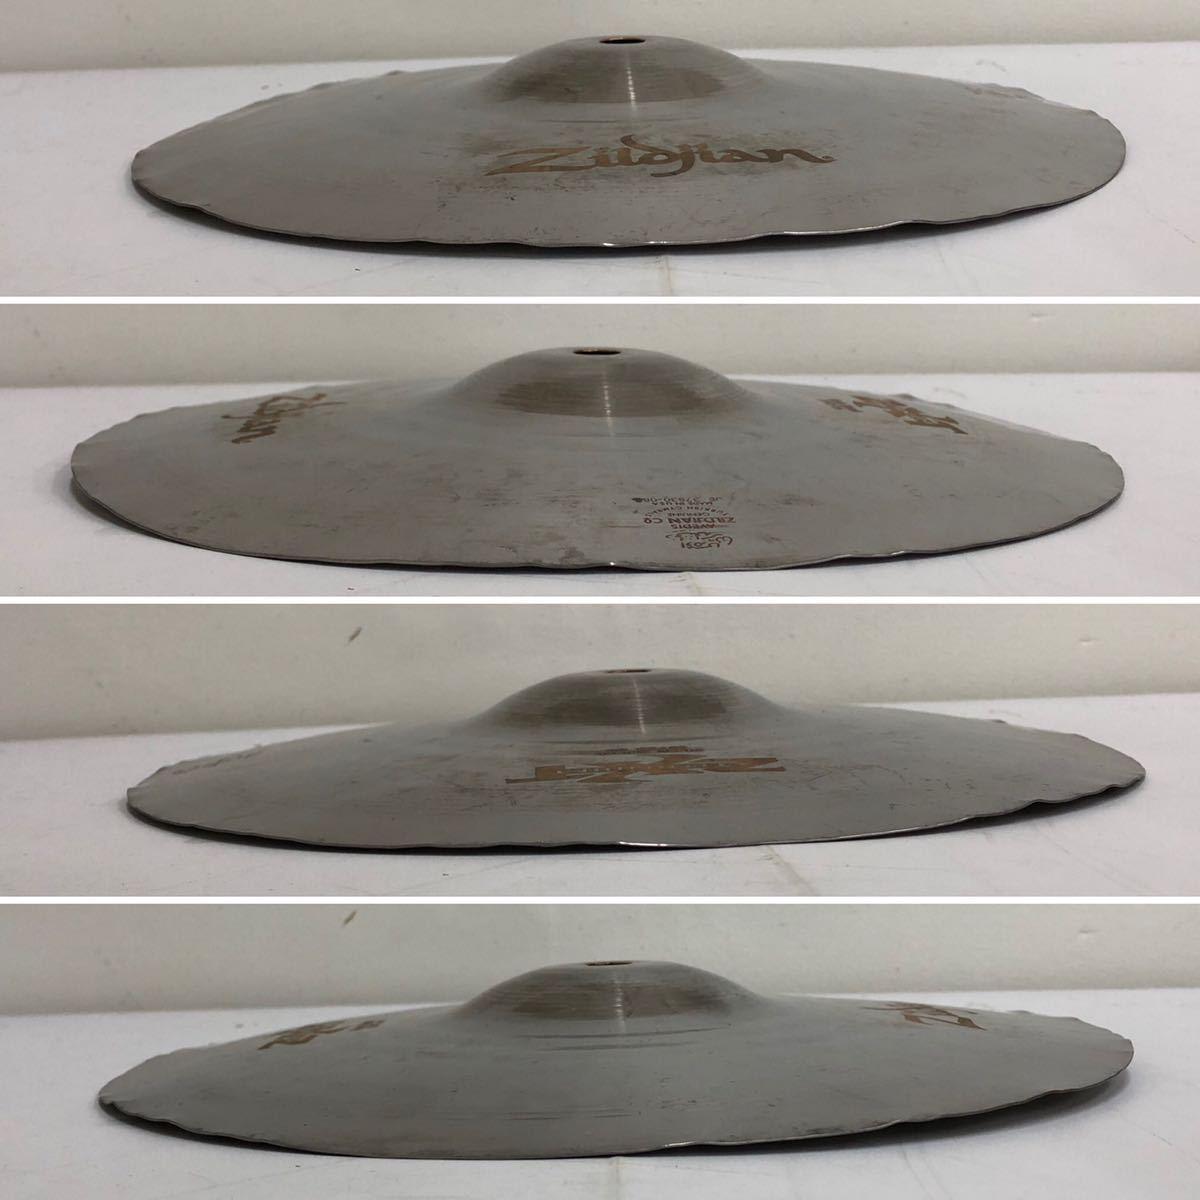 □Zildjian ジルジャン ZXT TITANIUM Flash Splash シンバル ドラム 打楽器 楽器 10インチ スプラッシュ パーカッション □21073005_画像4